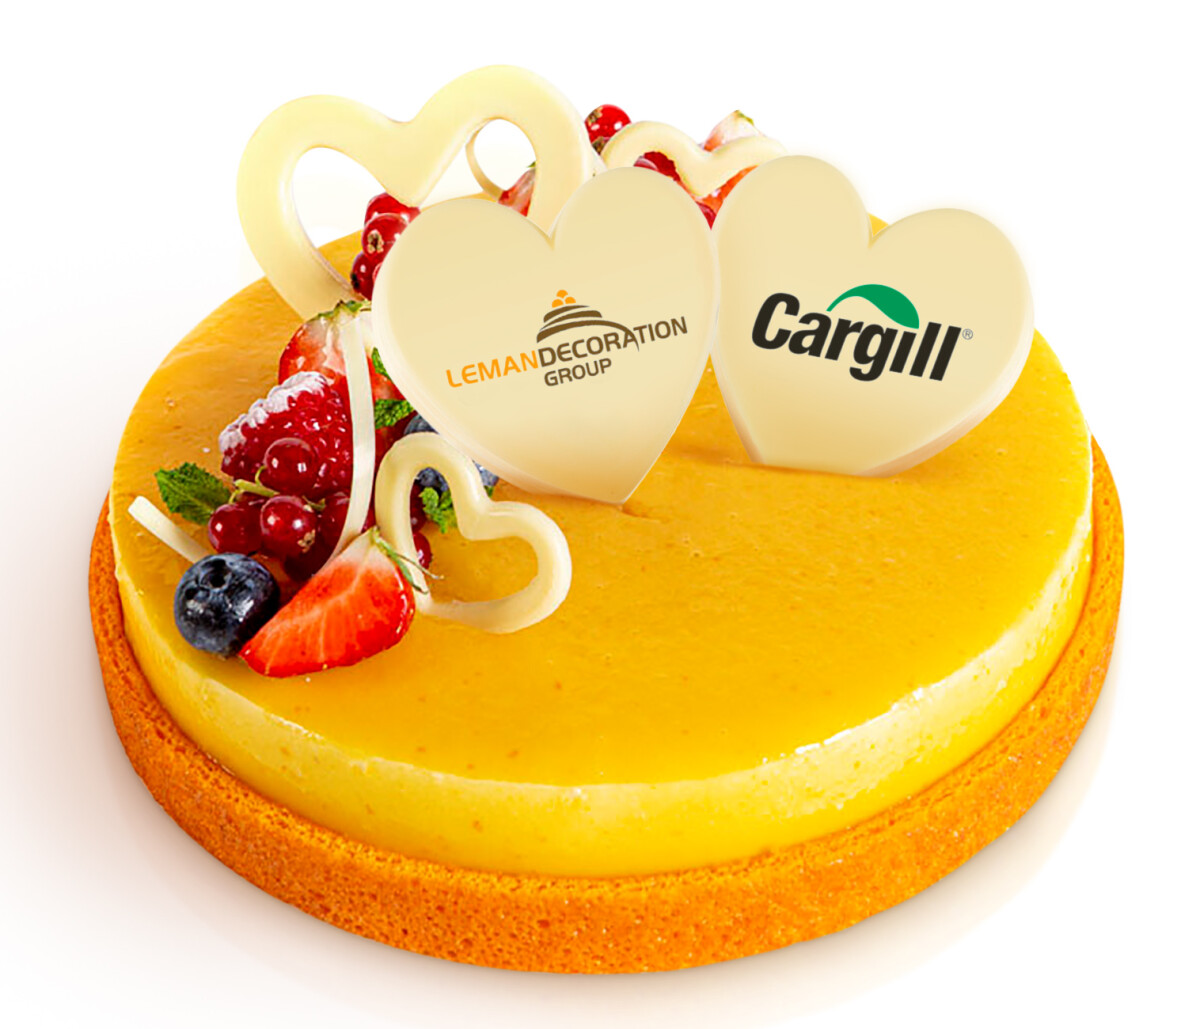 Cargill acquires Leman Decoration Group